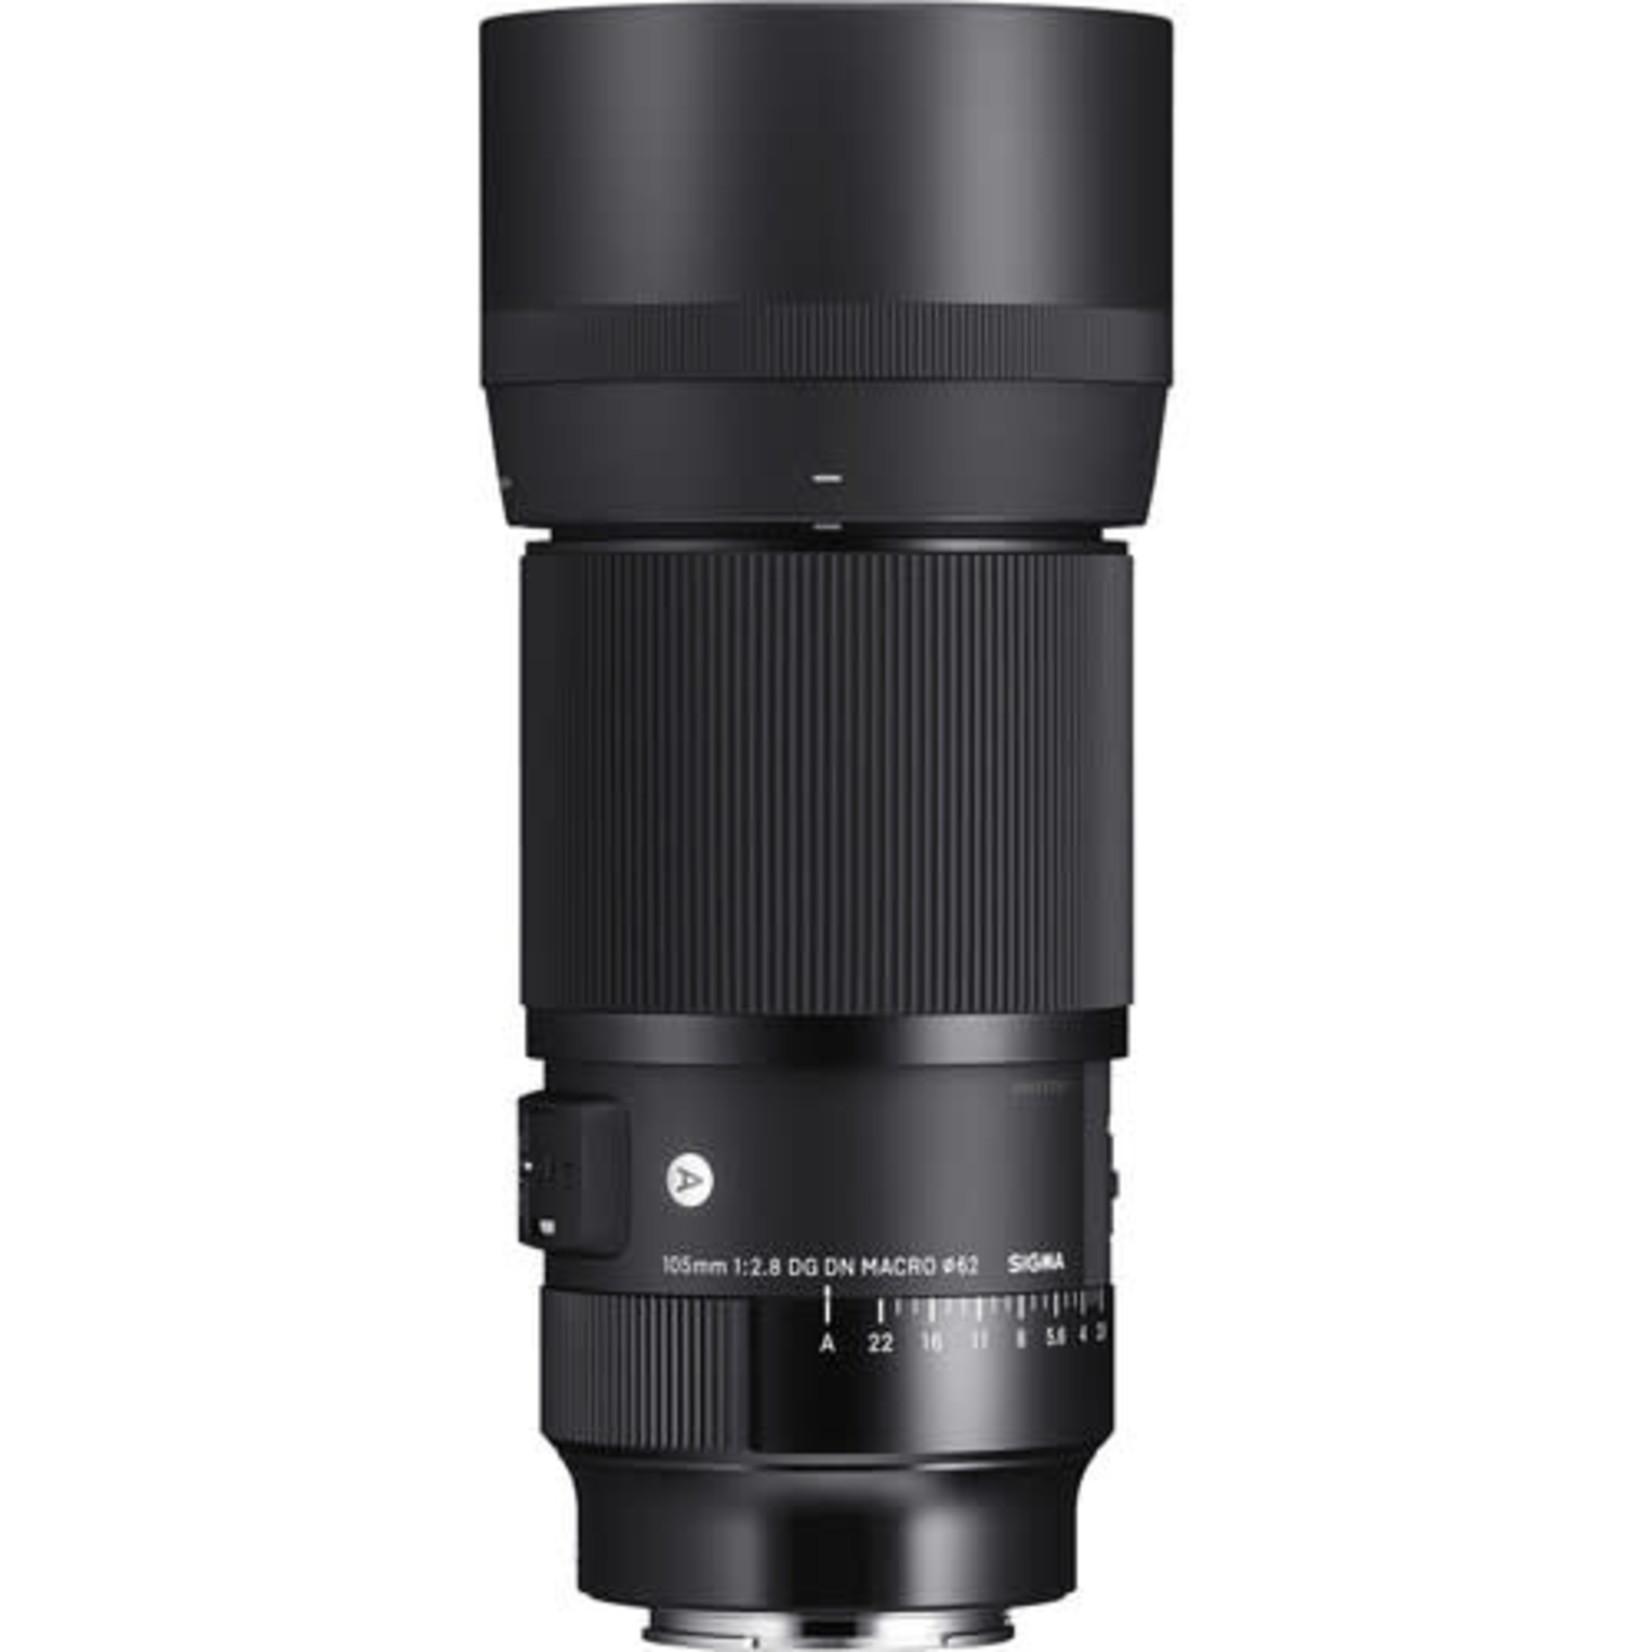 Sigma Sigma 105mm f/2.8 DG DN Macro Art Lens for Sony E